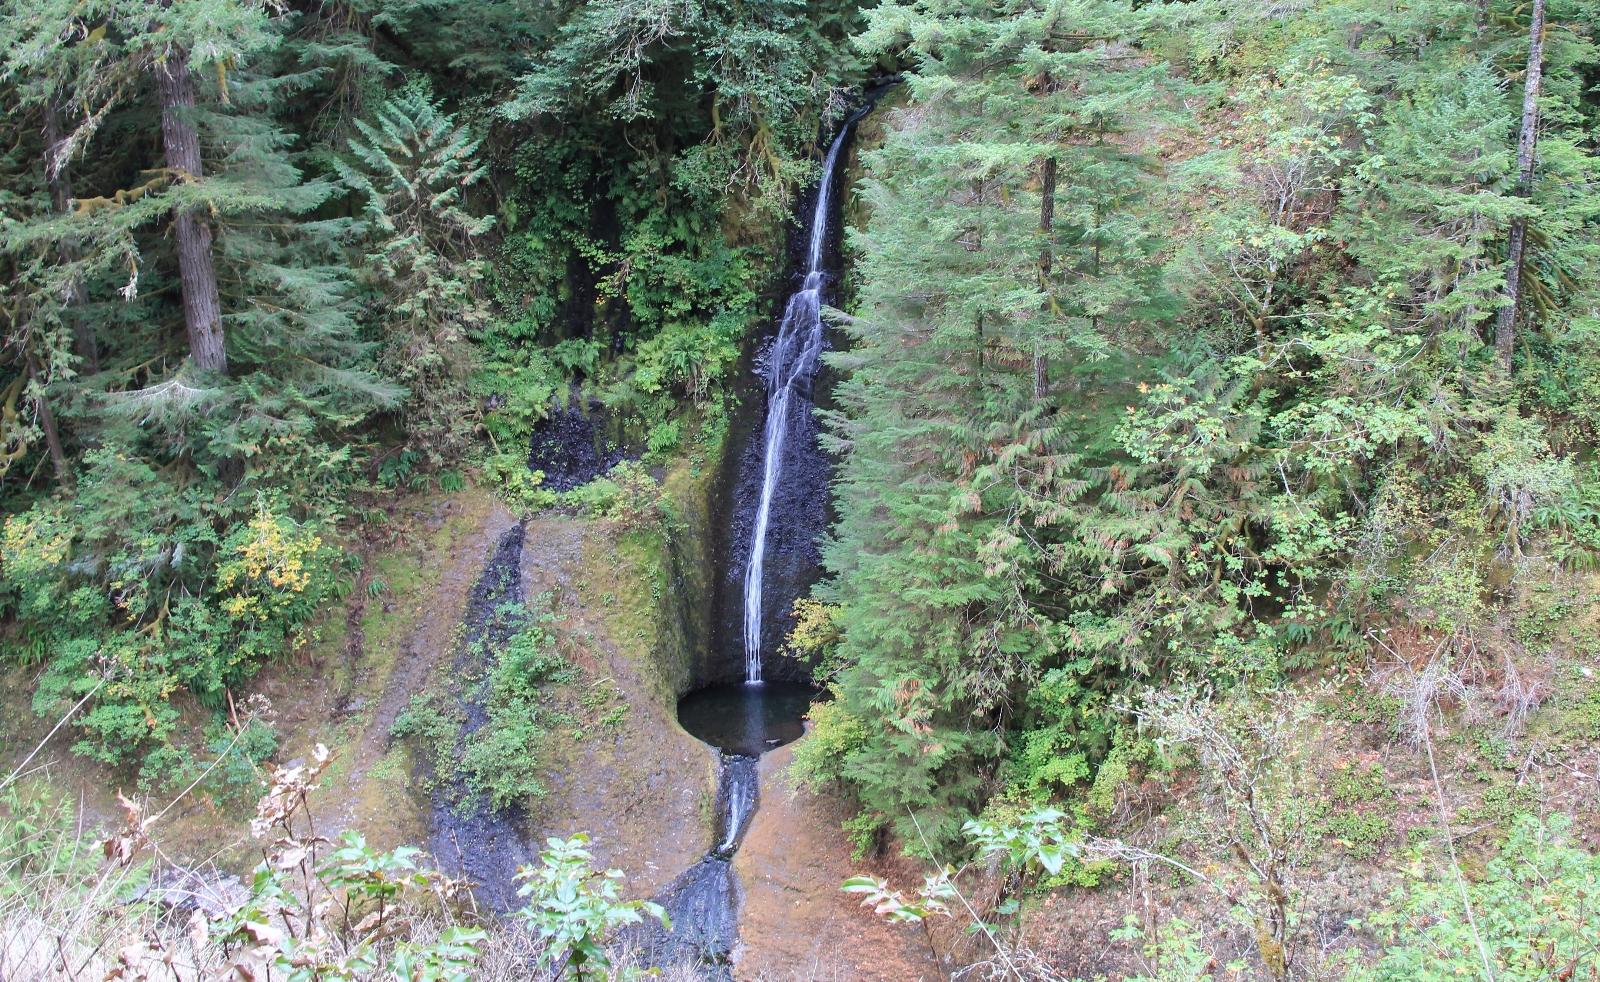 09-14-15 Eagle Creek hike (48)